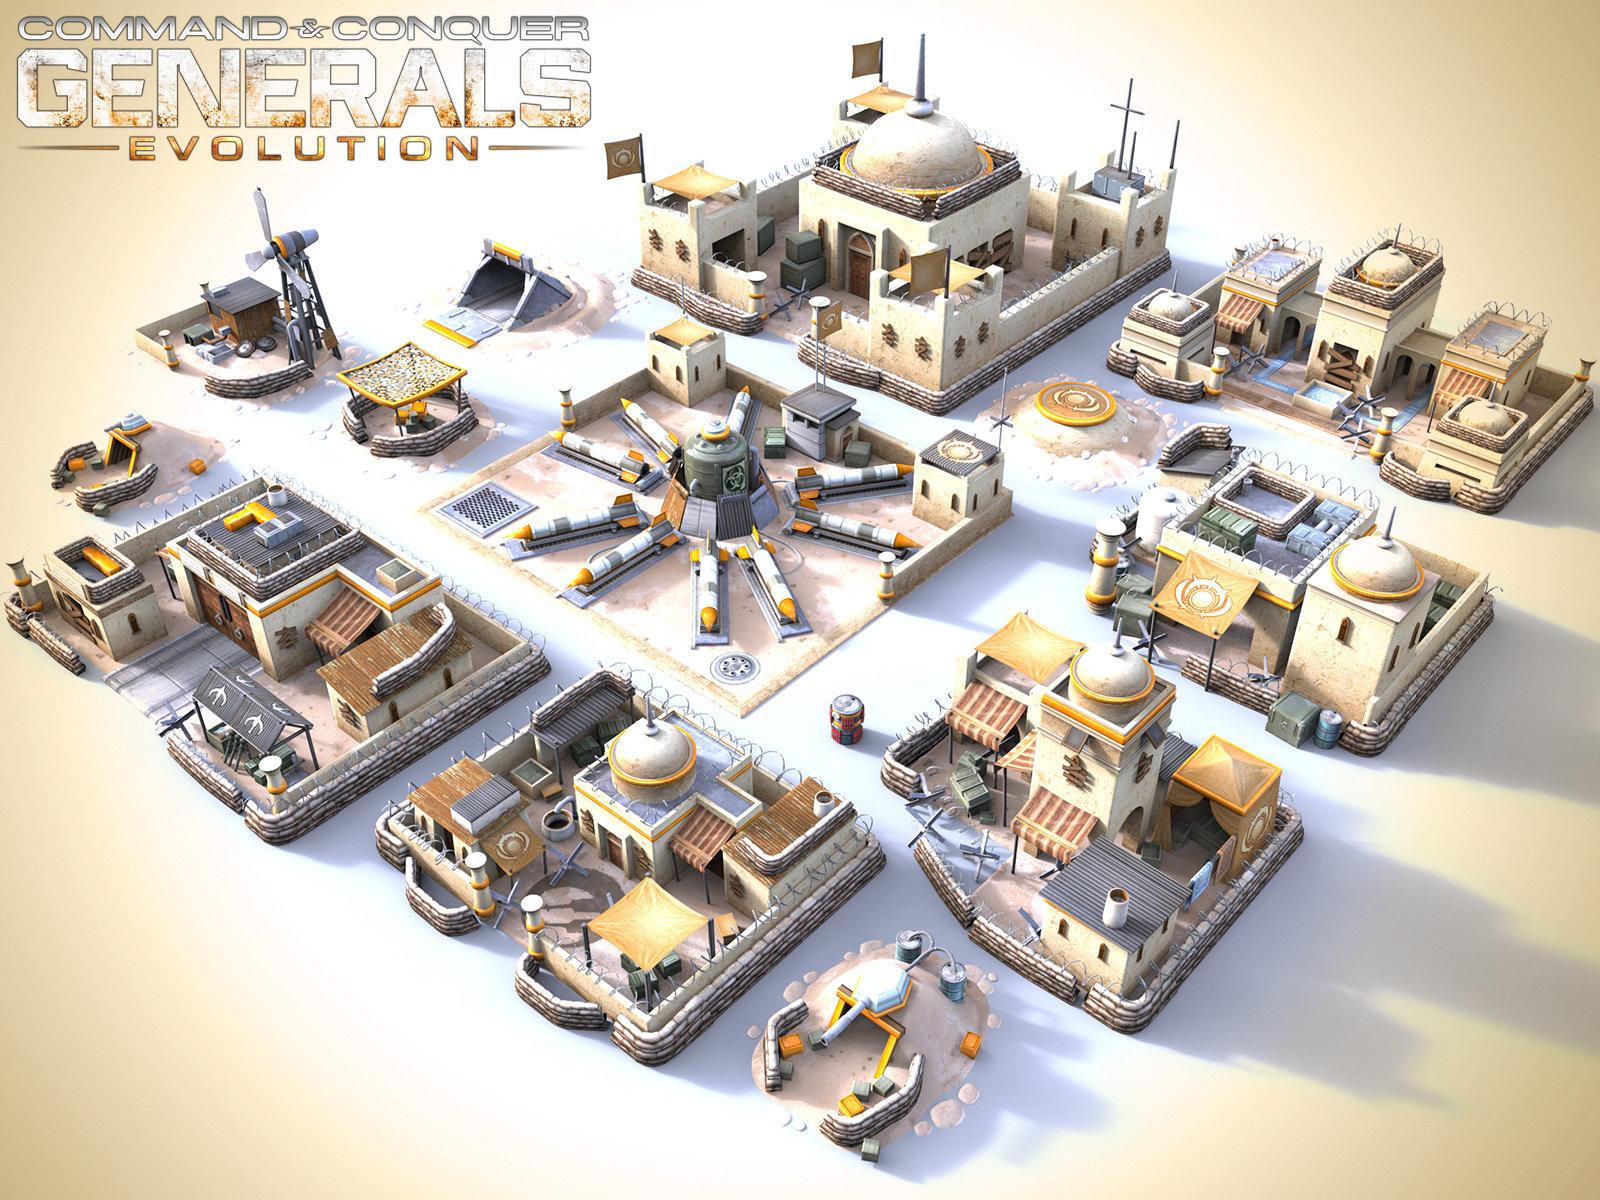 soenke-seidel-02-cnc-generals-evolution-gla-buildings-render.jpg